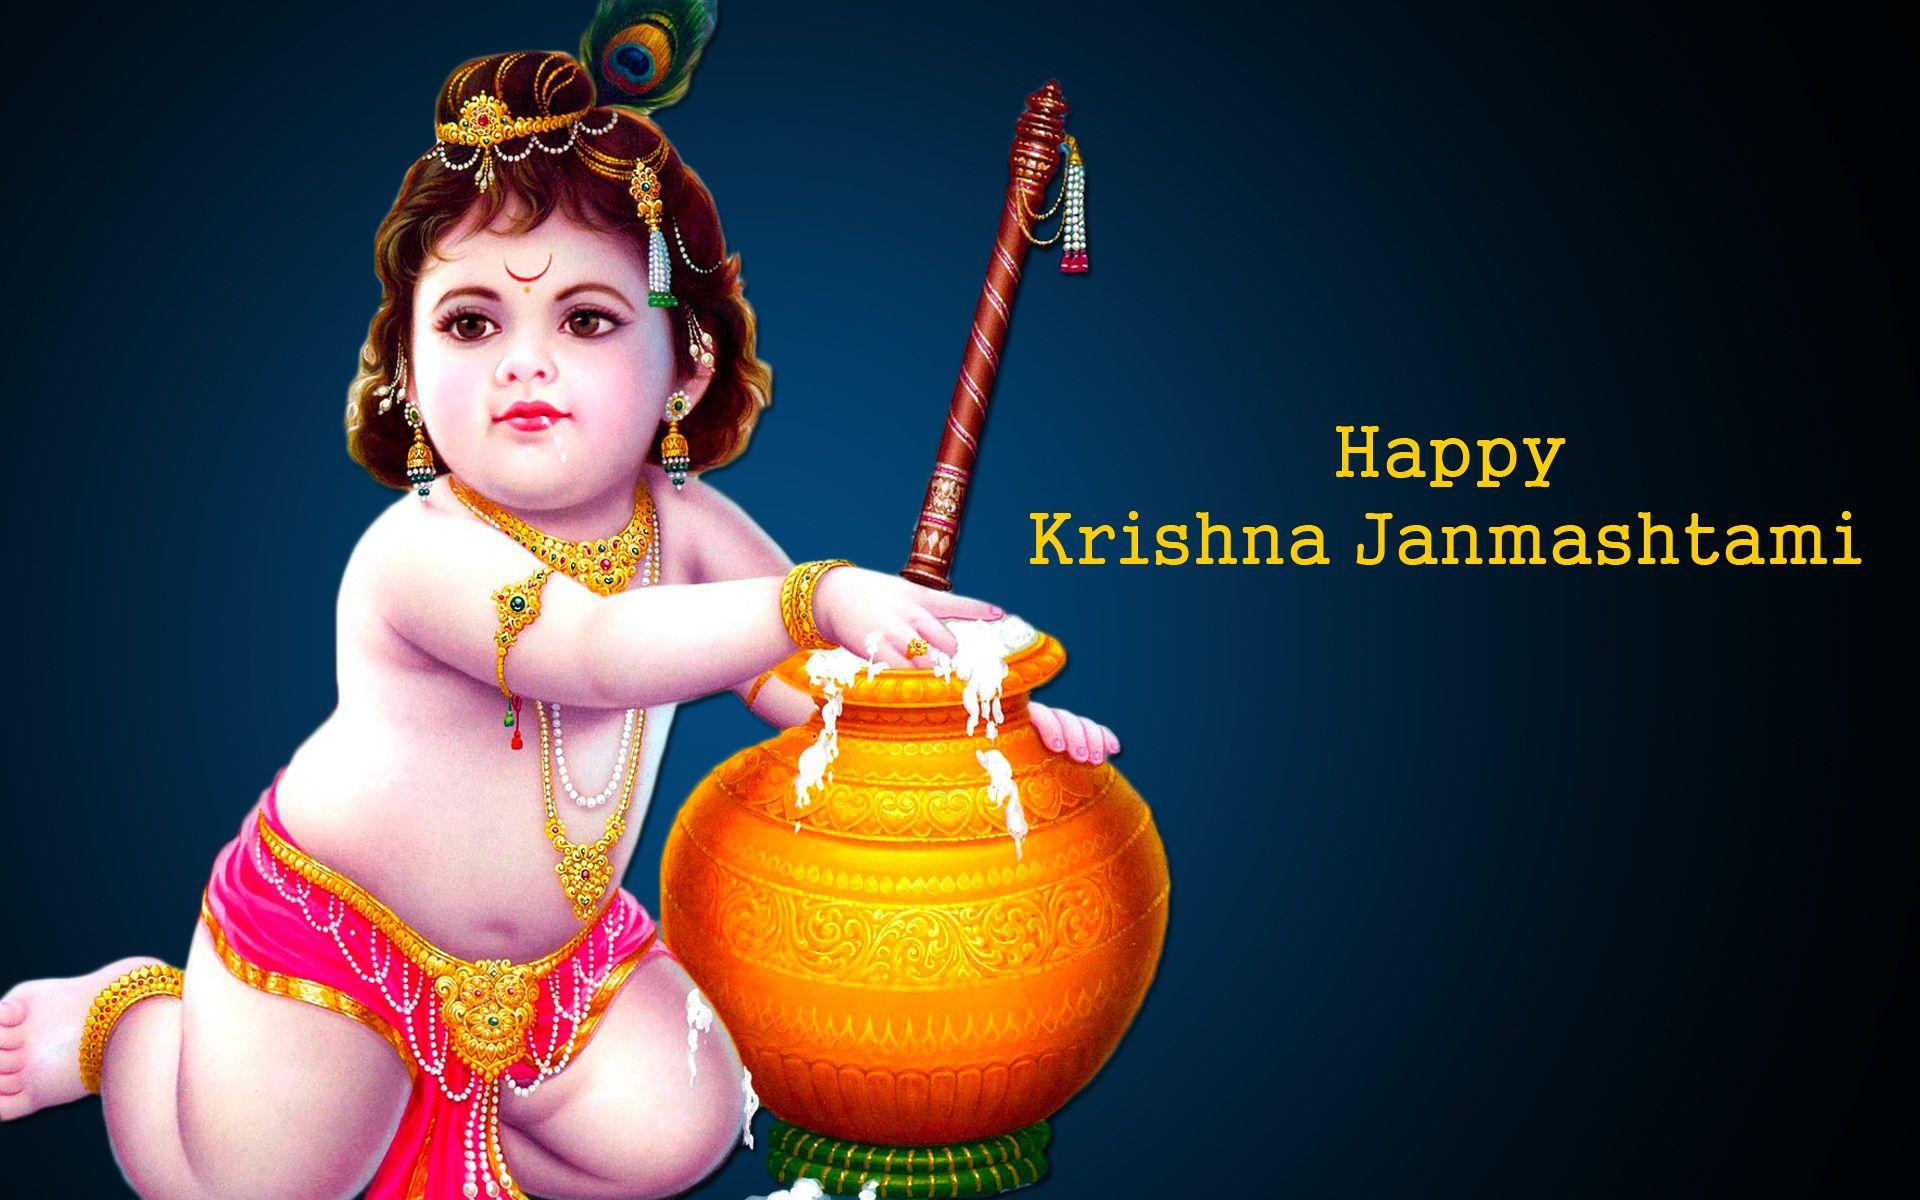 Picture Of Bal Krishna Eating Makhan For Happy Janmashtami Hd Wallpaper With Text Bal Krishna Krishna Krishna Janmashtami